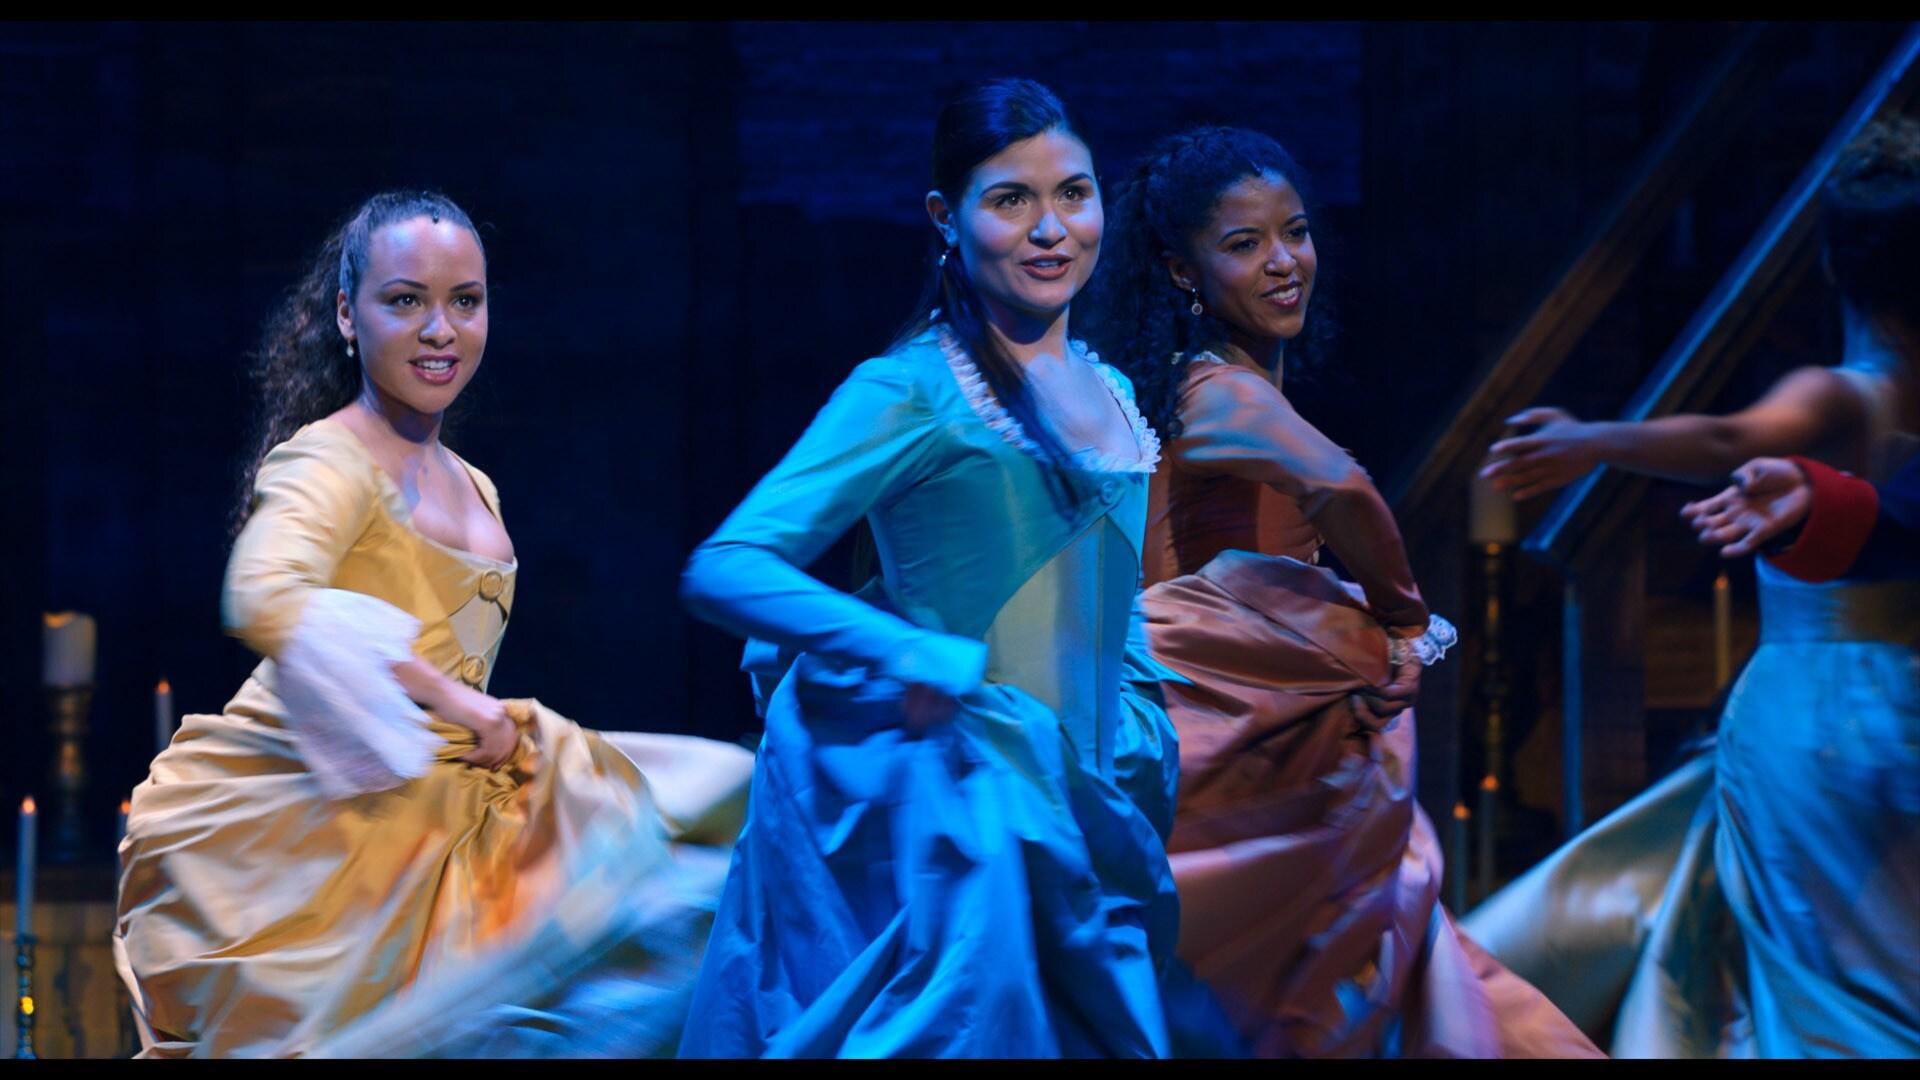 Jasmine Cephas Jones is Peggy Schuyler, Phillipa Soo is Eliza Hamilton and Renée Elise Goldsberry is Angelica Schuyler in HAMILTON, the filmed version of the original Broadway production.